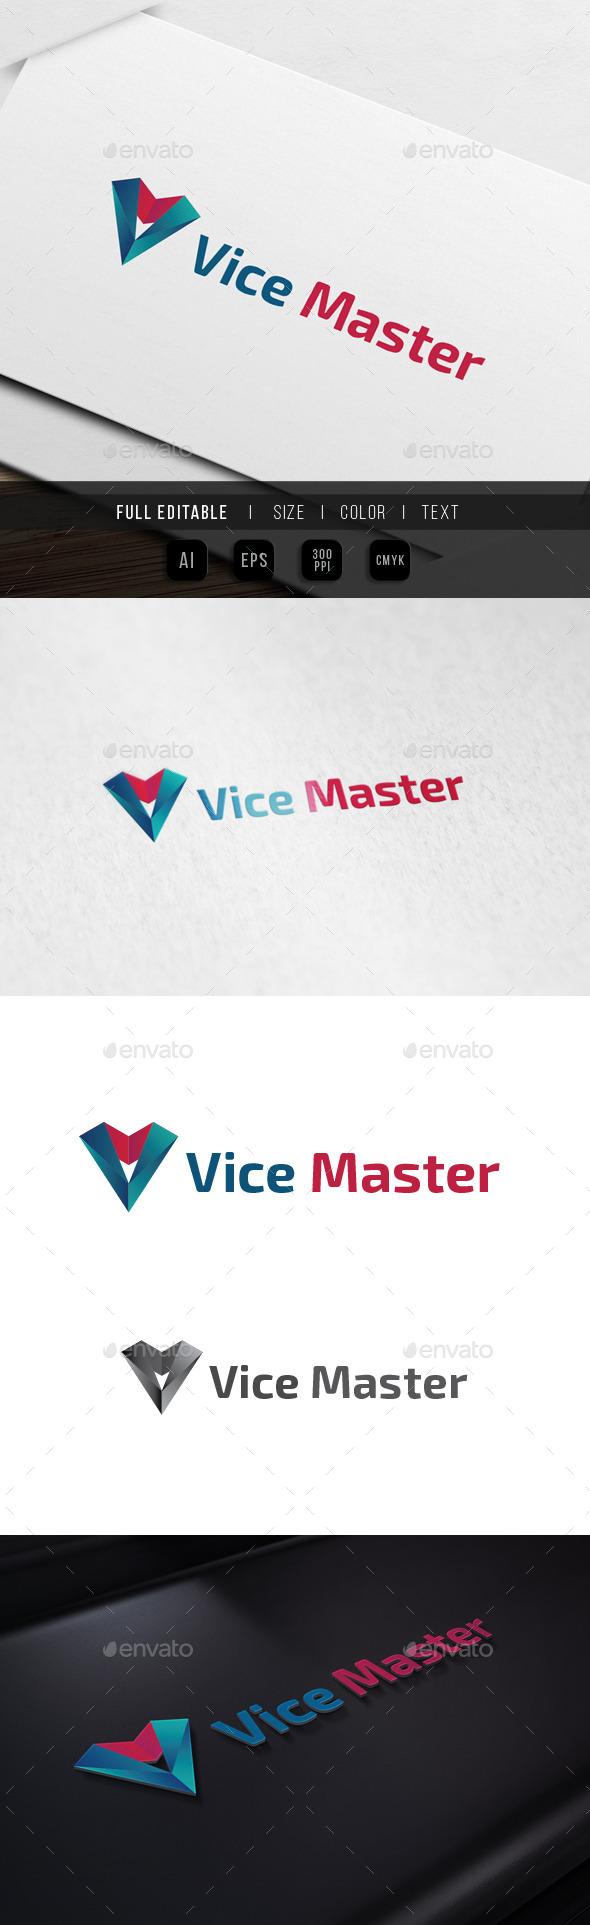 Letter V - Victory Agency - Vision Studio - Letters Logo Templates